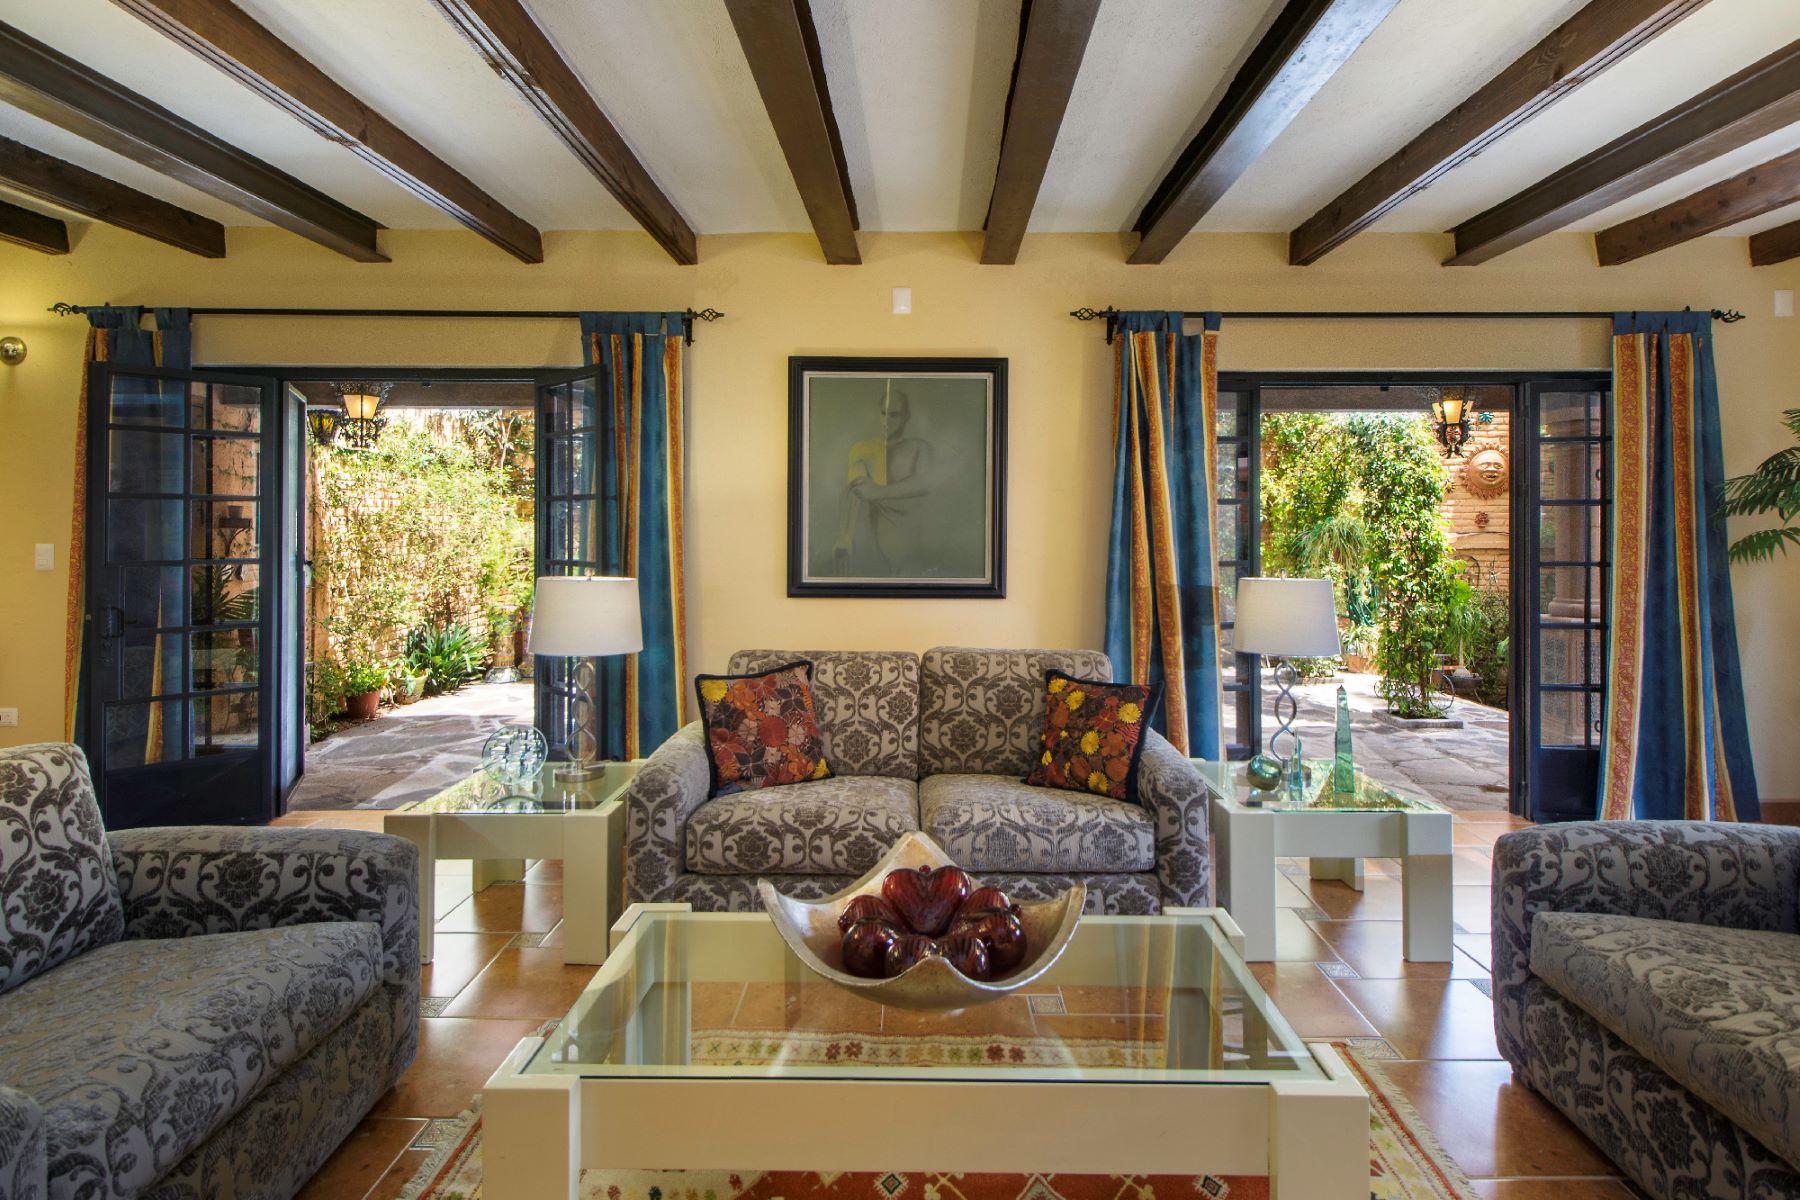 Single Family Homes for Sale at Dos Casas Privada de Pila Seca #1 San Miguel De Allende, Guanajuato 37700 Mexico